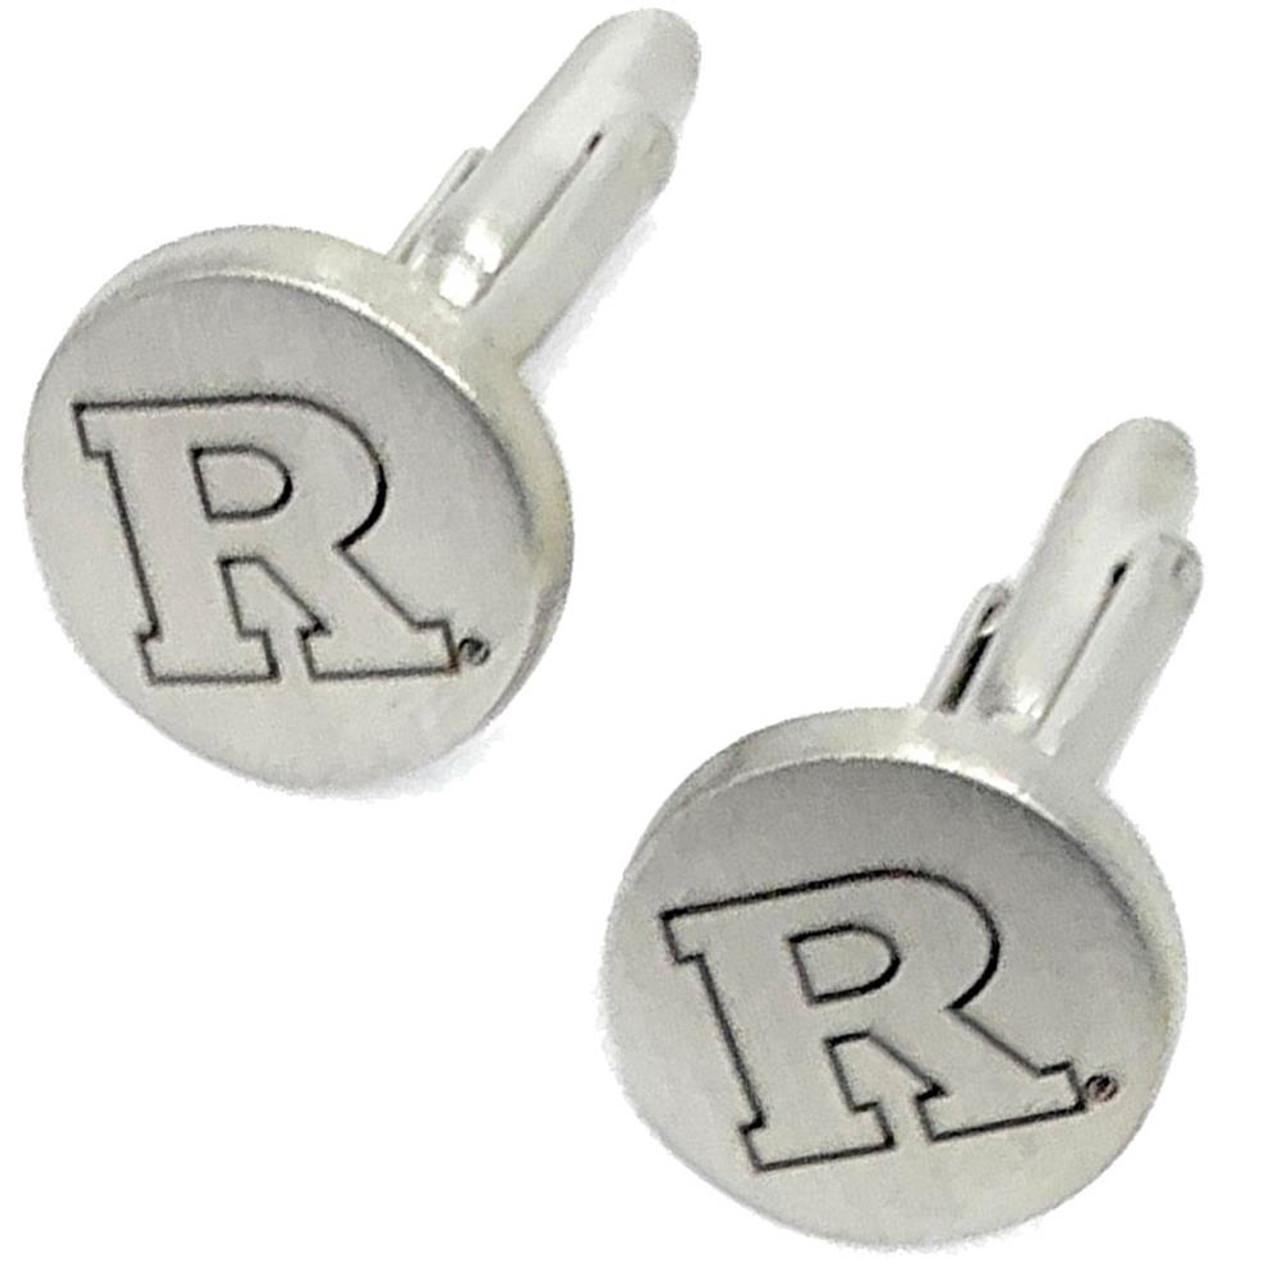 Rutgers University Cuff Links Silver Cufflink Set